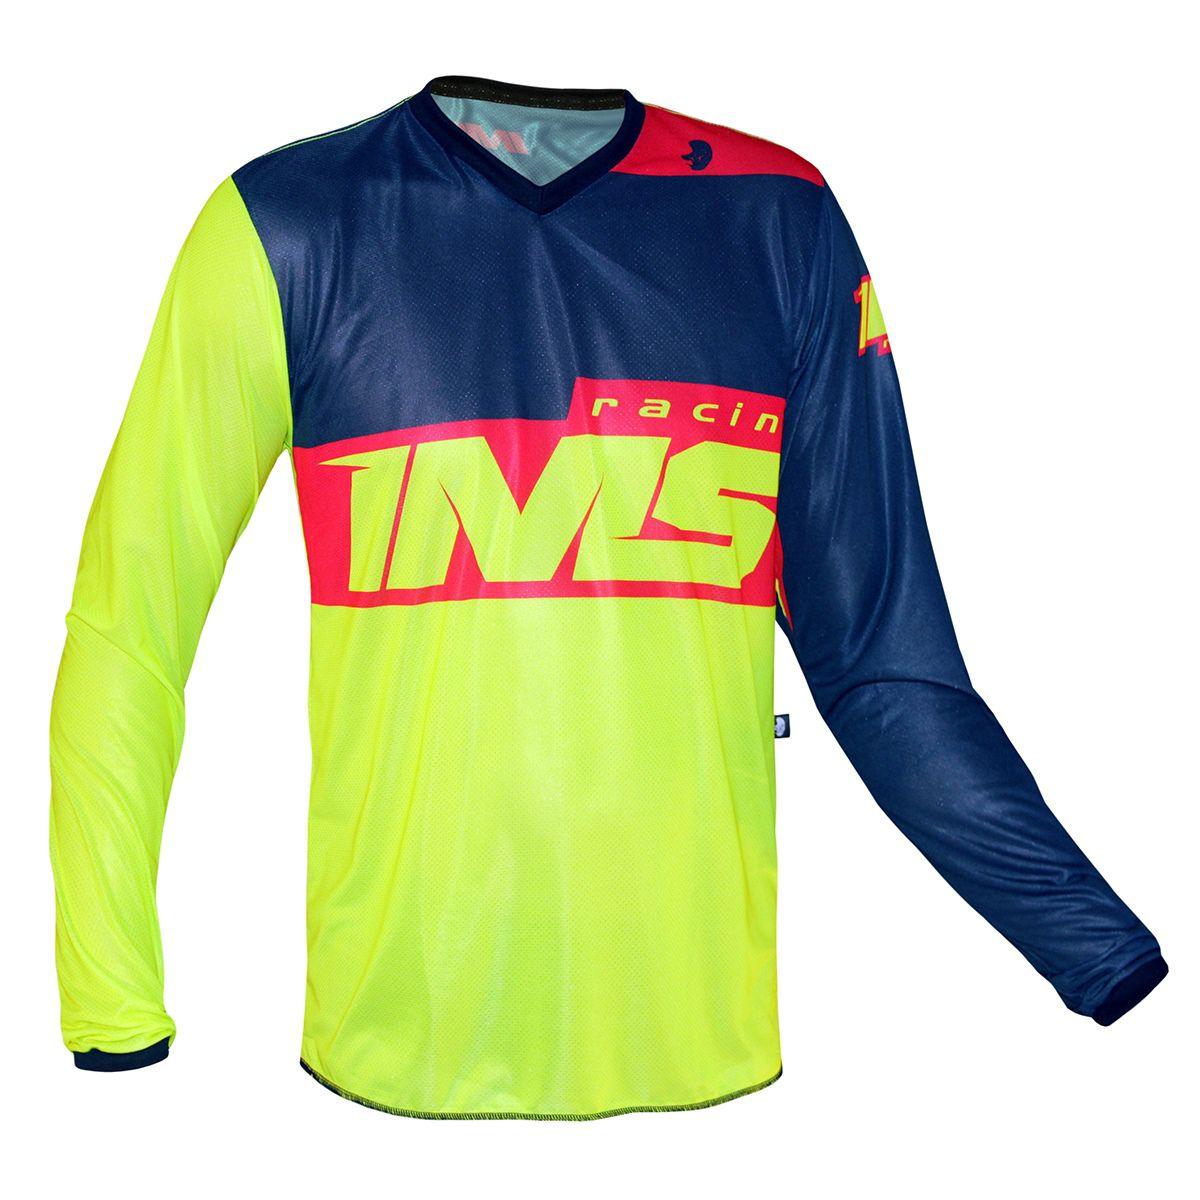 Camisa Ims Army Vermelho Fluor Motocross Trilha